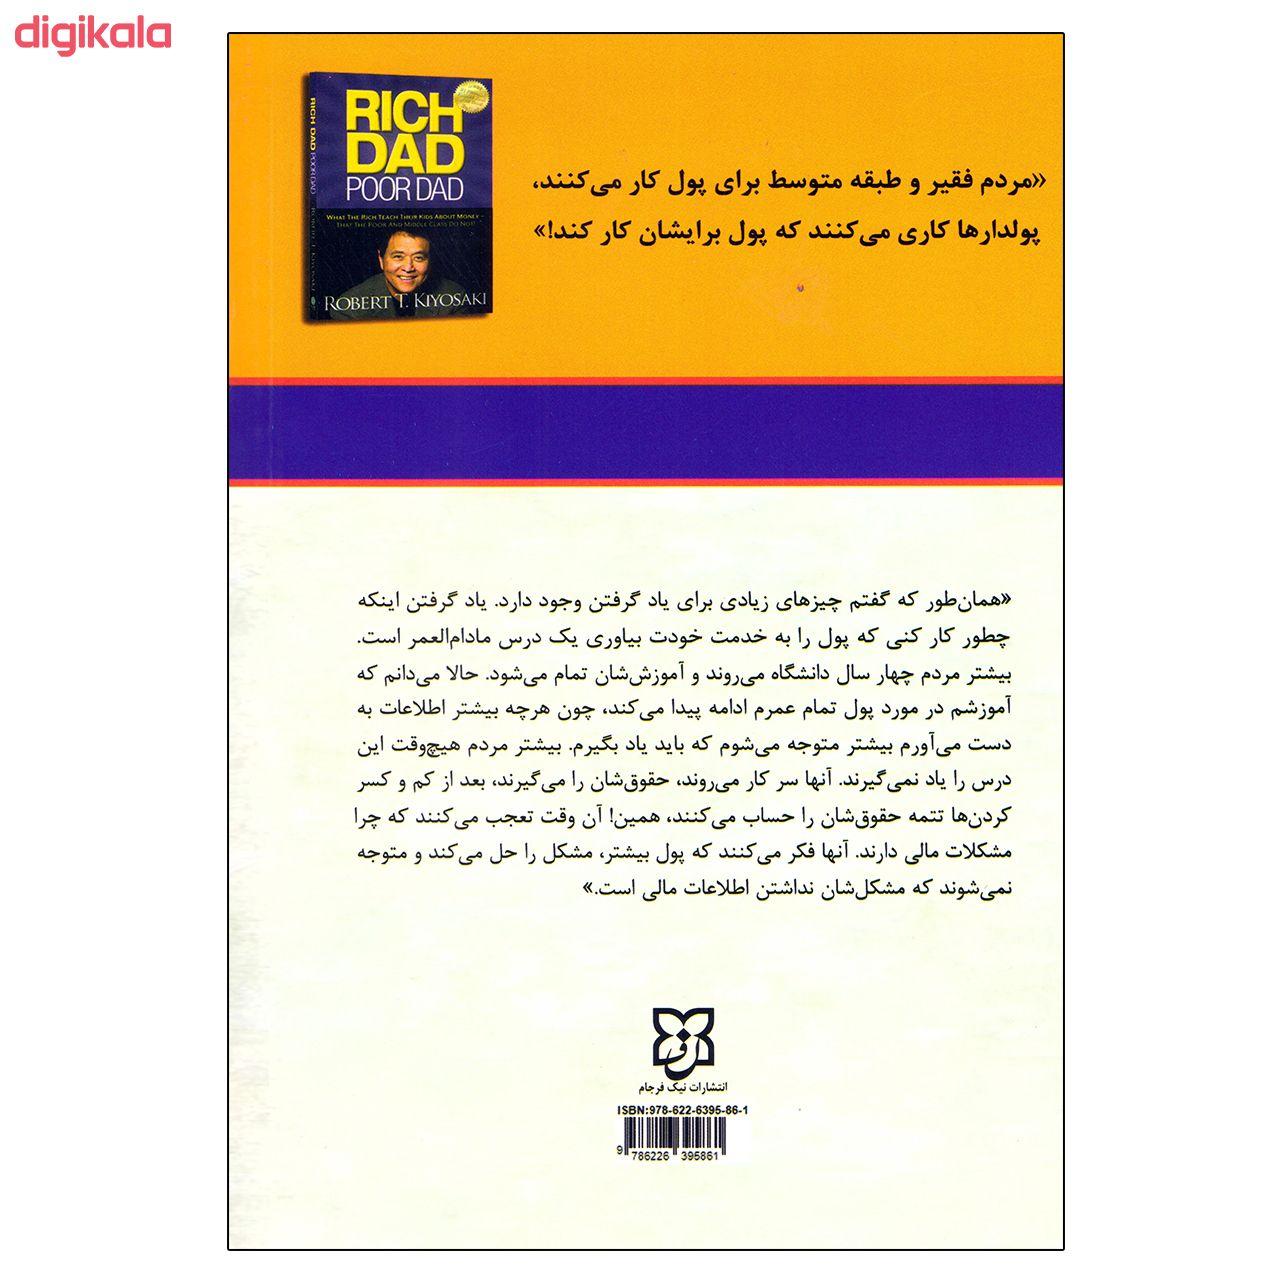 کتاب پدر پولدار پدر بی پول اثر رابرت کیوساکی نشر نیک فرجام main 1 1